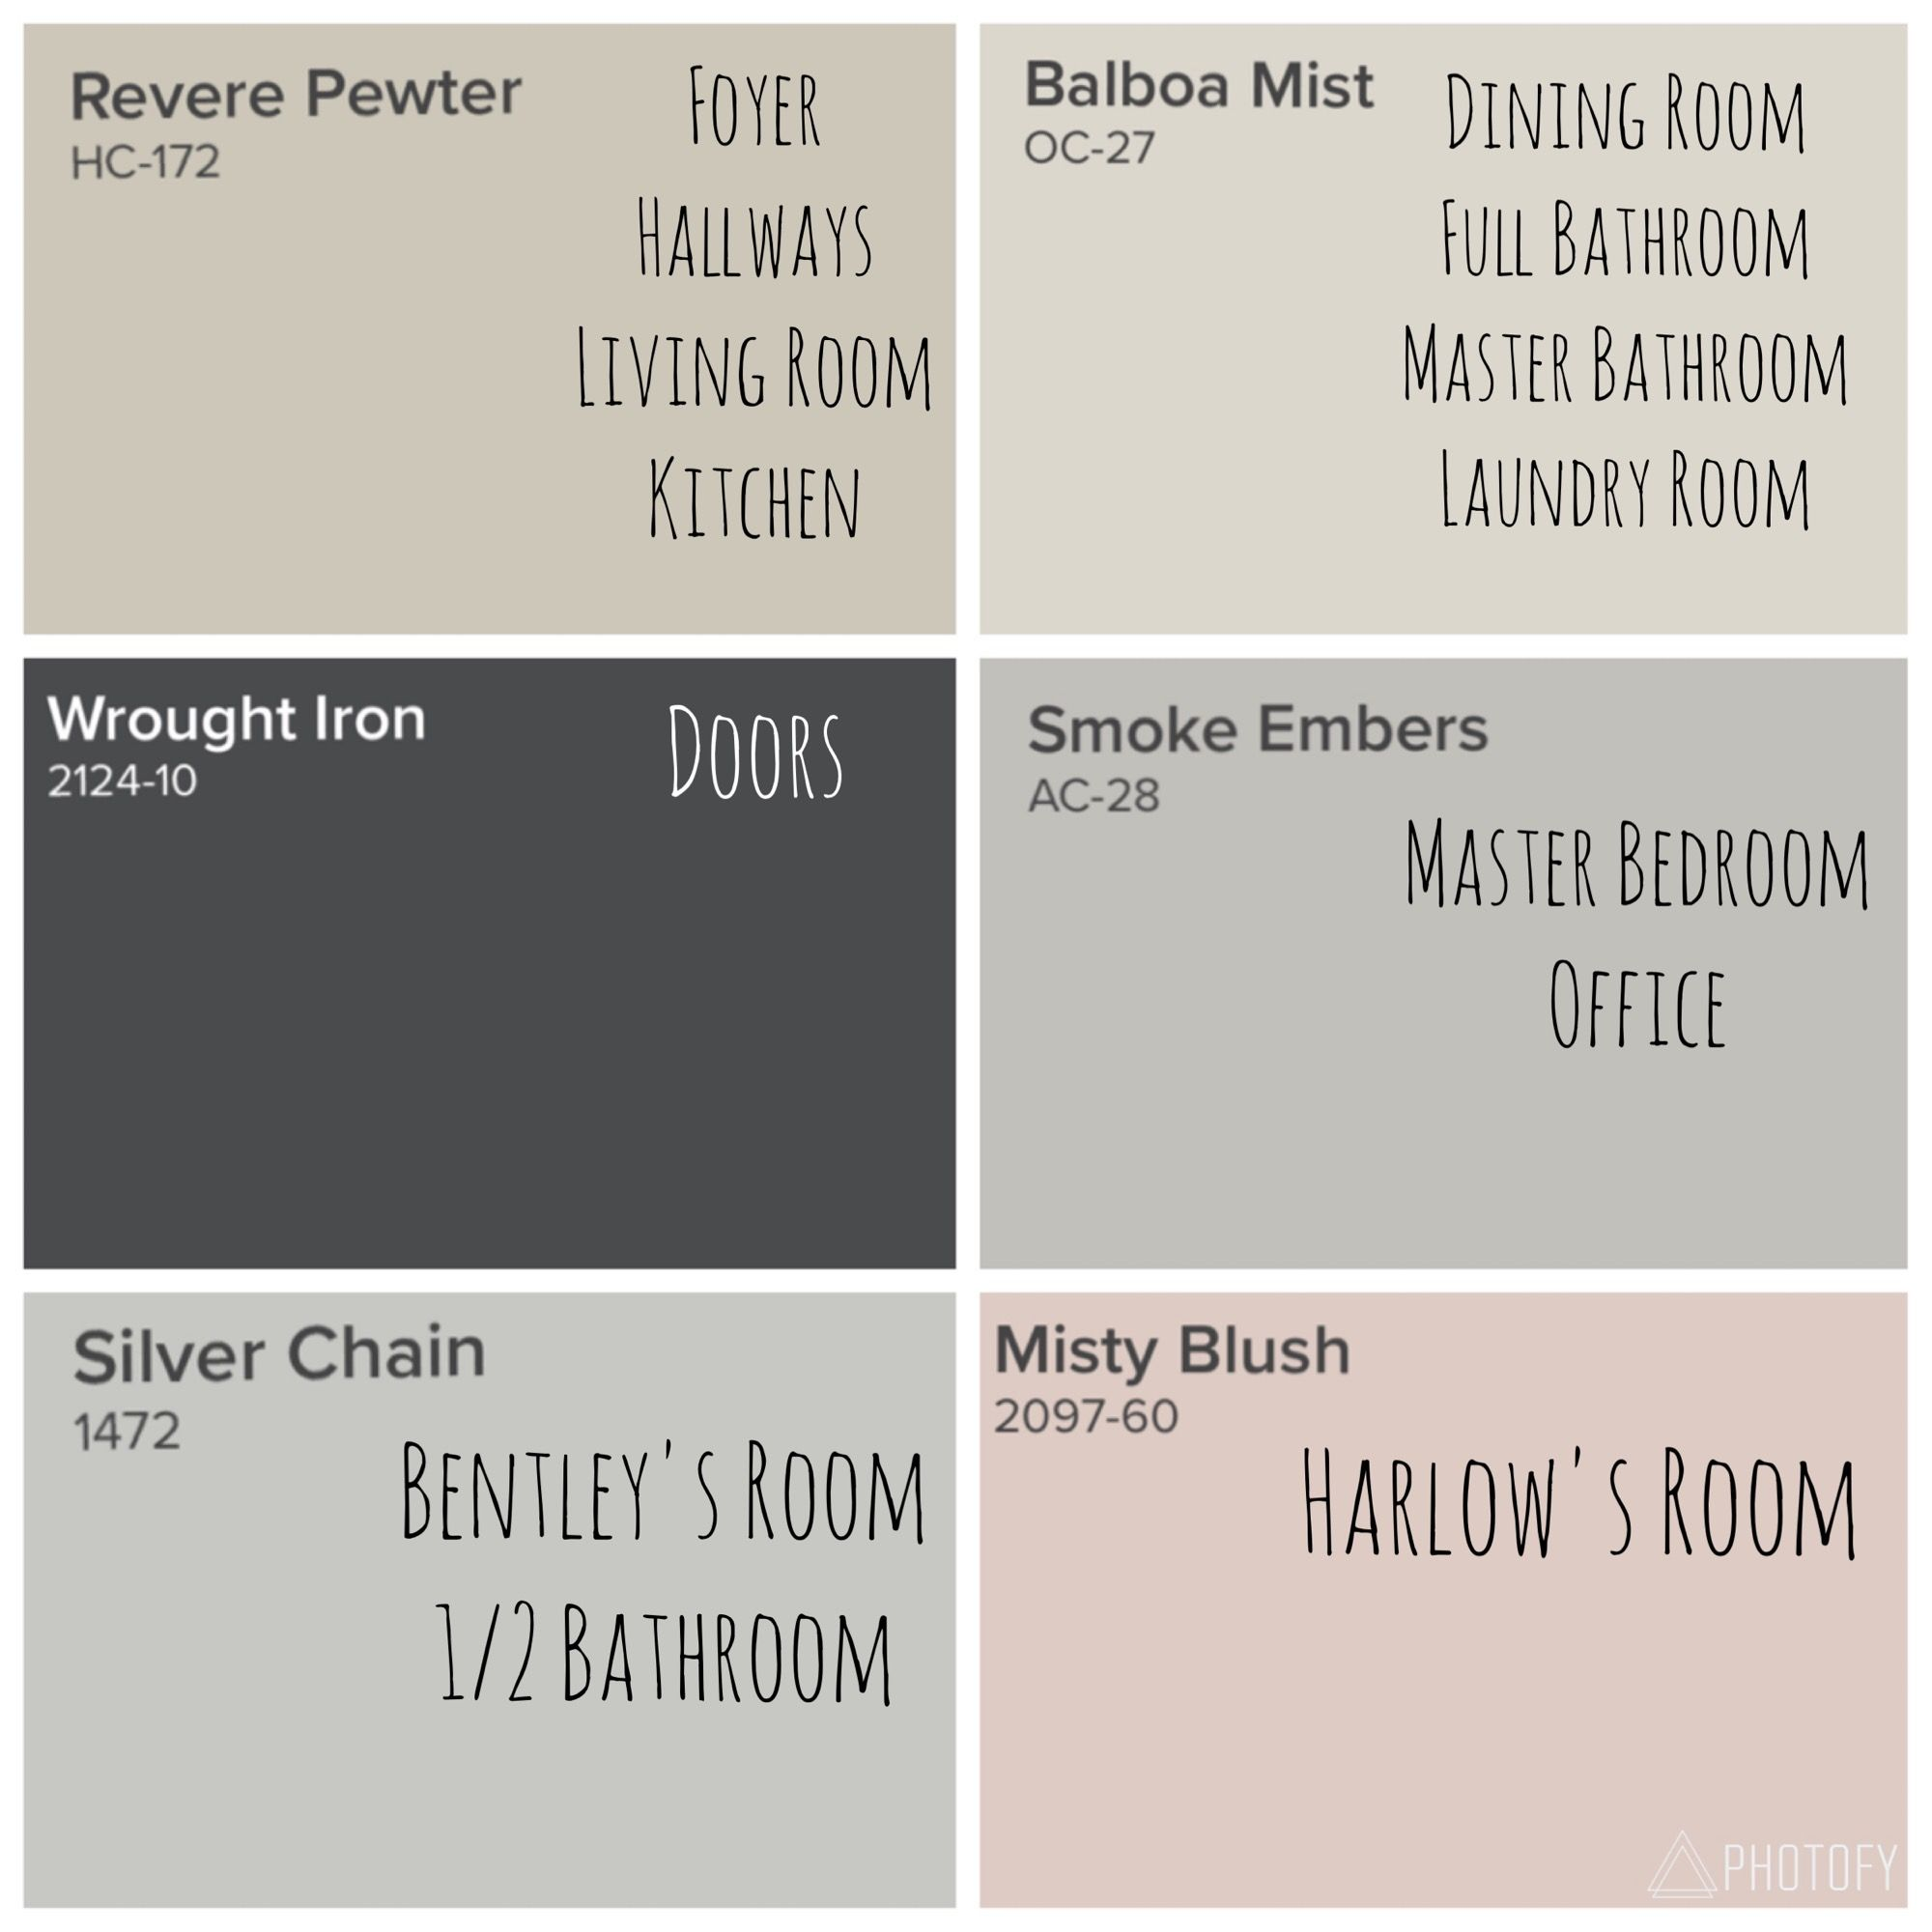 Benjamin Moore Whole House Color Scheme Revere Pewter Balboa Mist